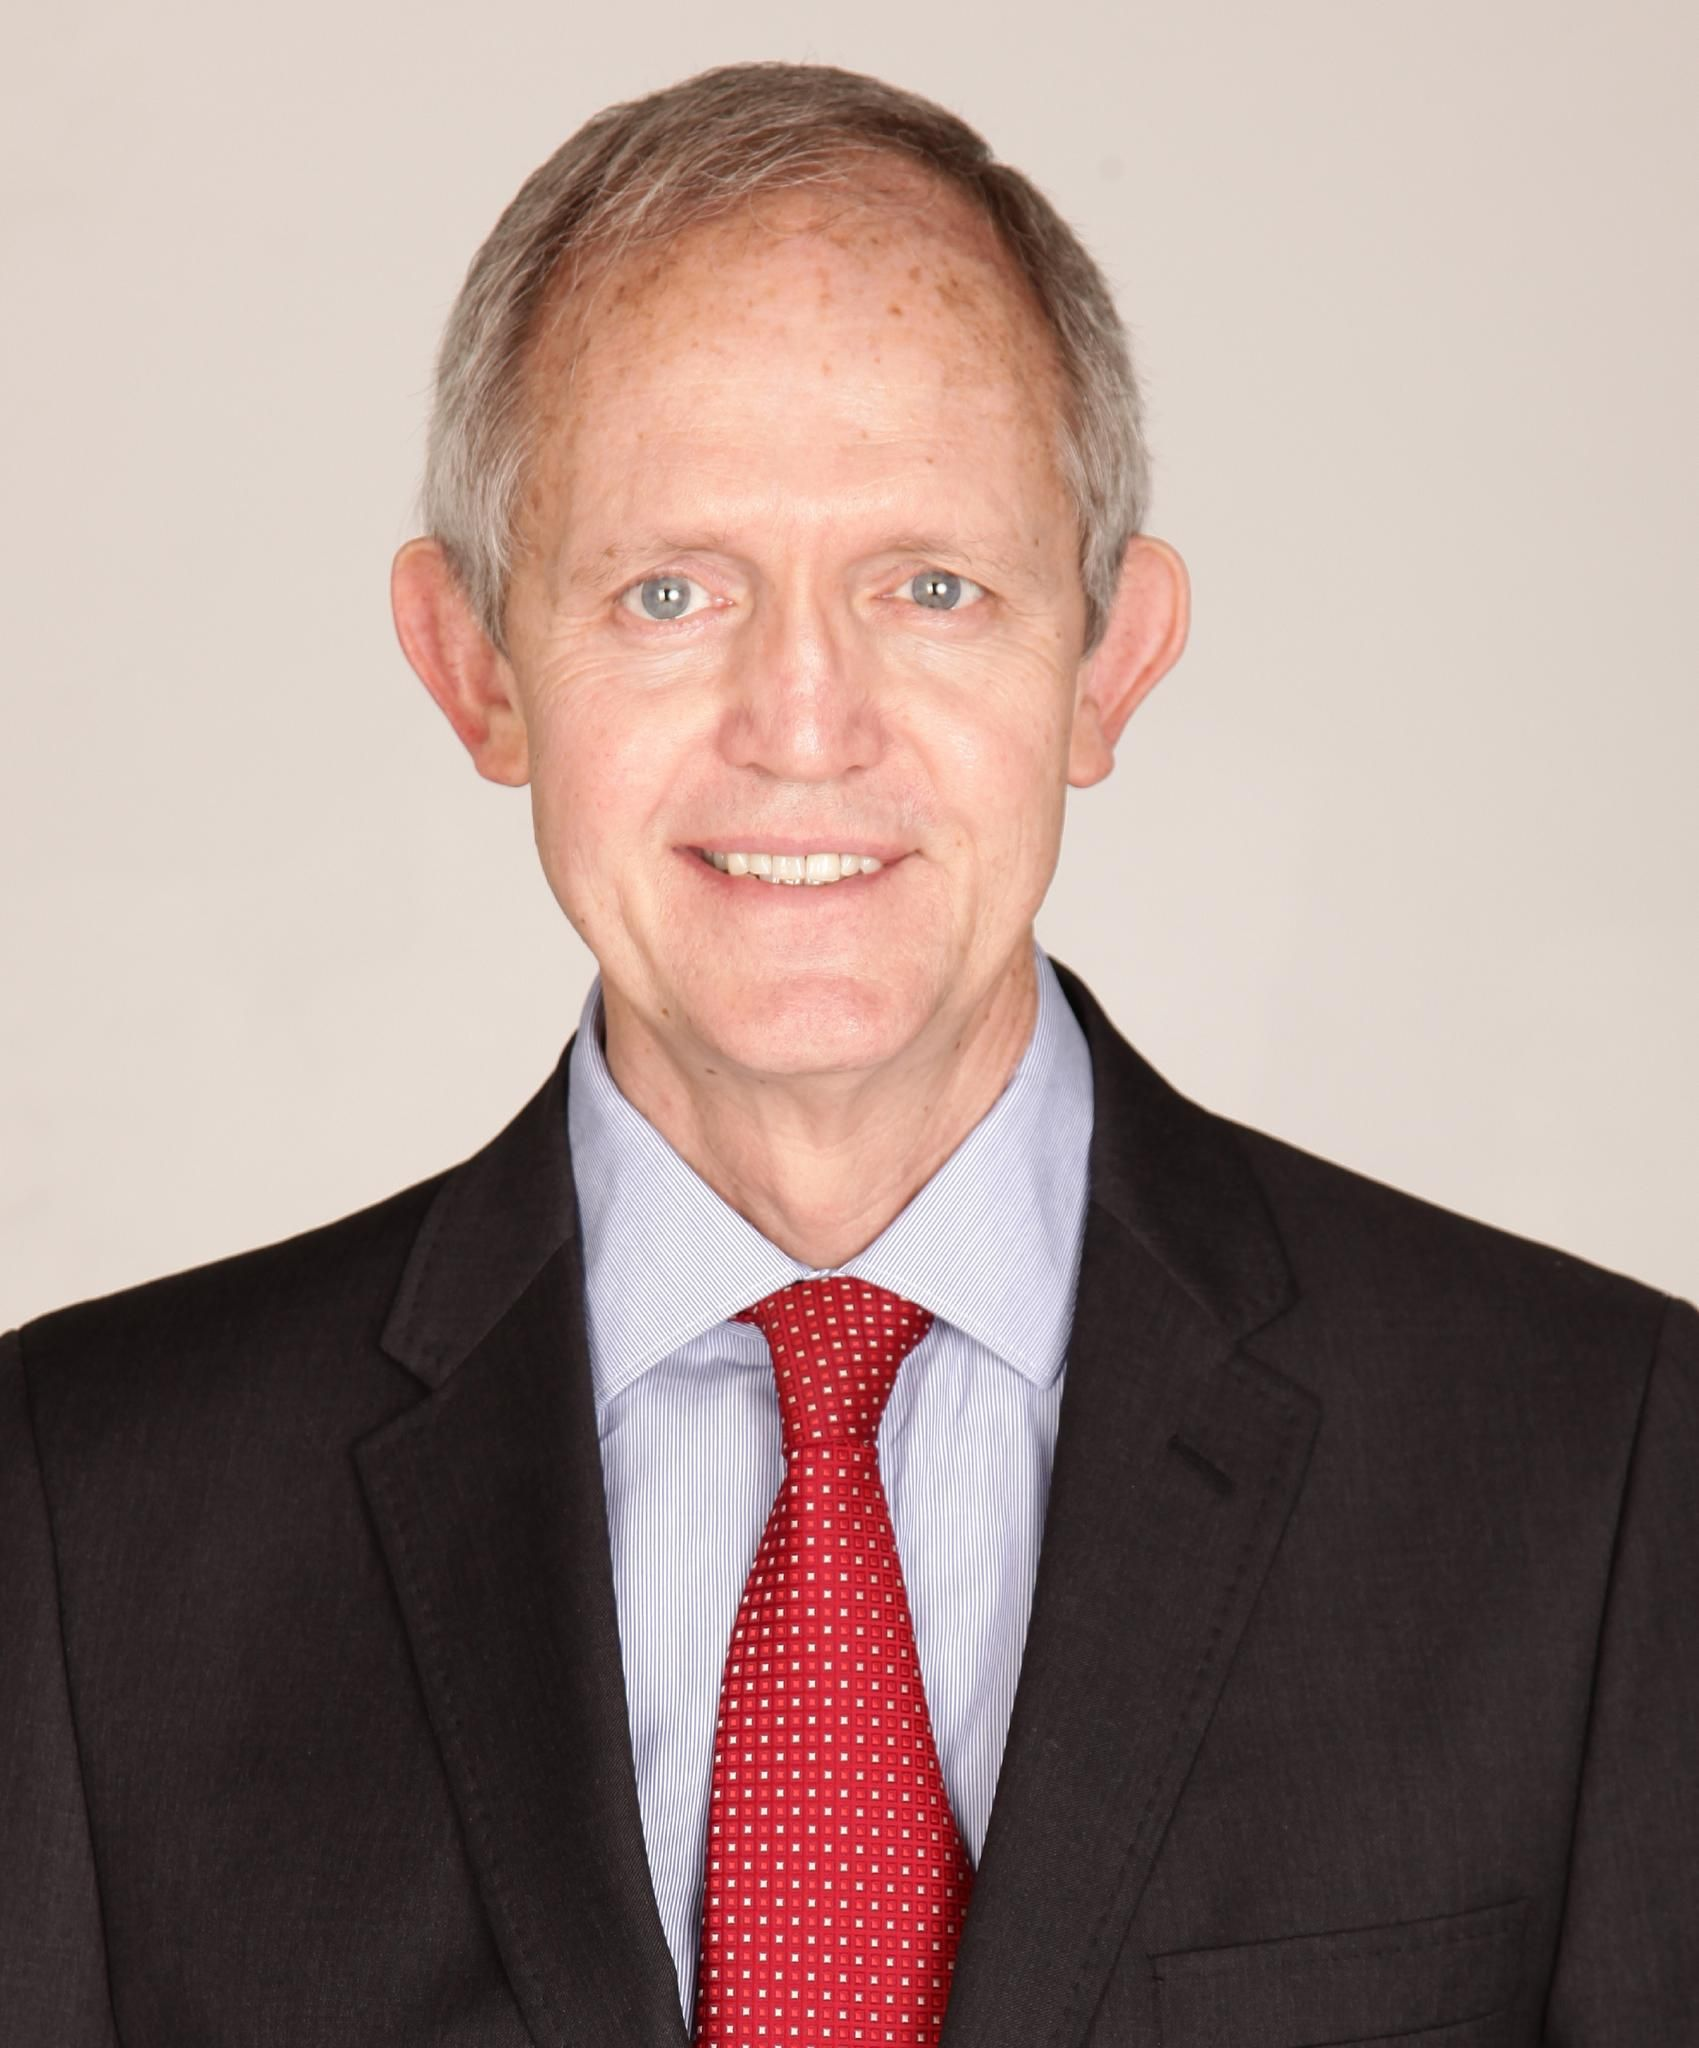 Izak du Plessis